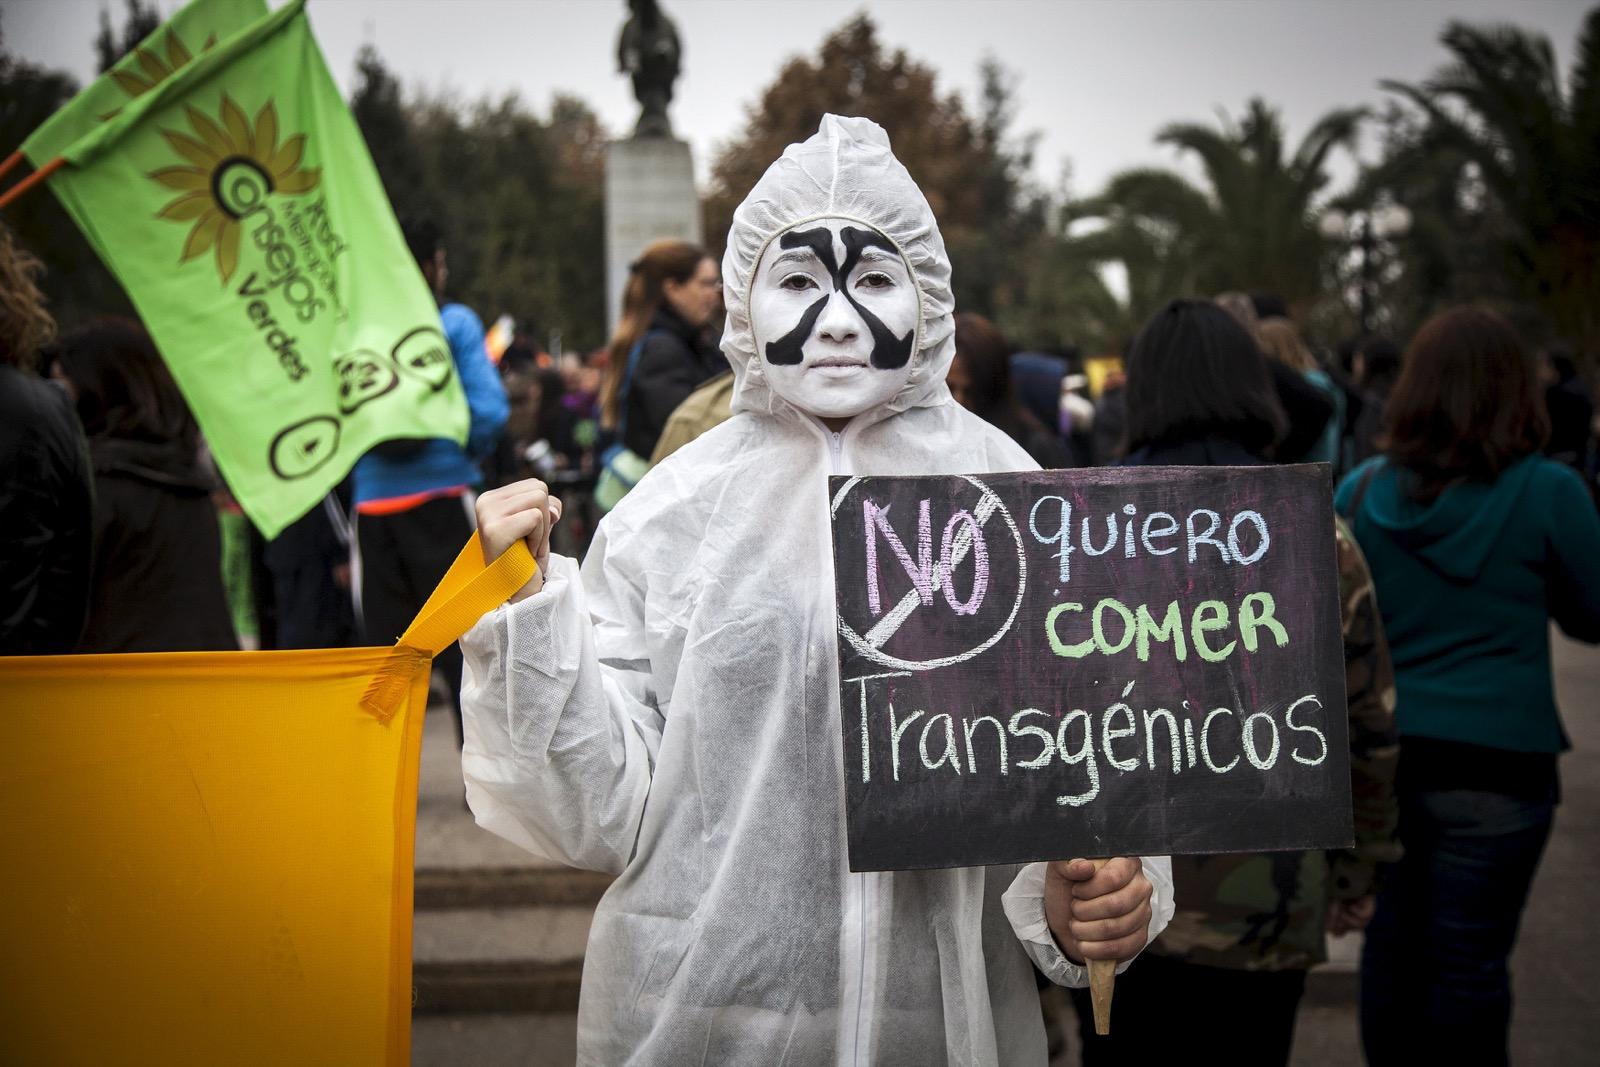 1432911201-2015-05-23T193818Z_1066177583_GF10000105558_RTRMADP_3_CHILE-PROTEST-MONSANTO.JPG